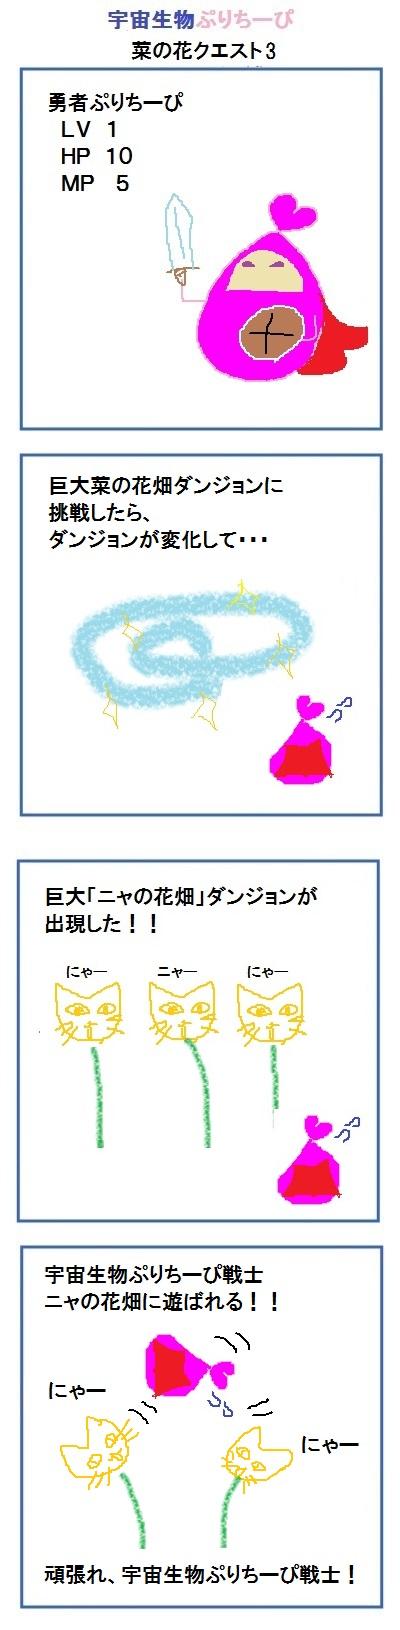 160316_nanohana_quest3.jpg